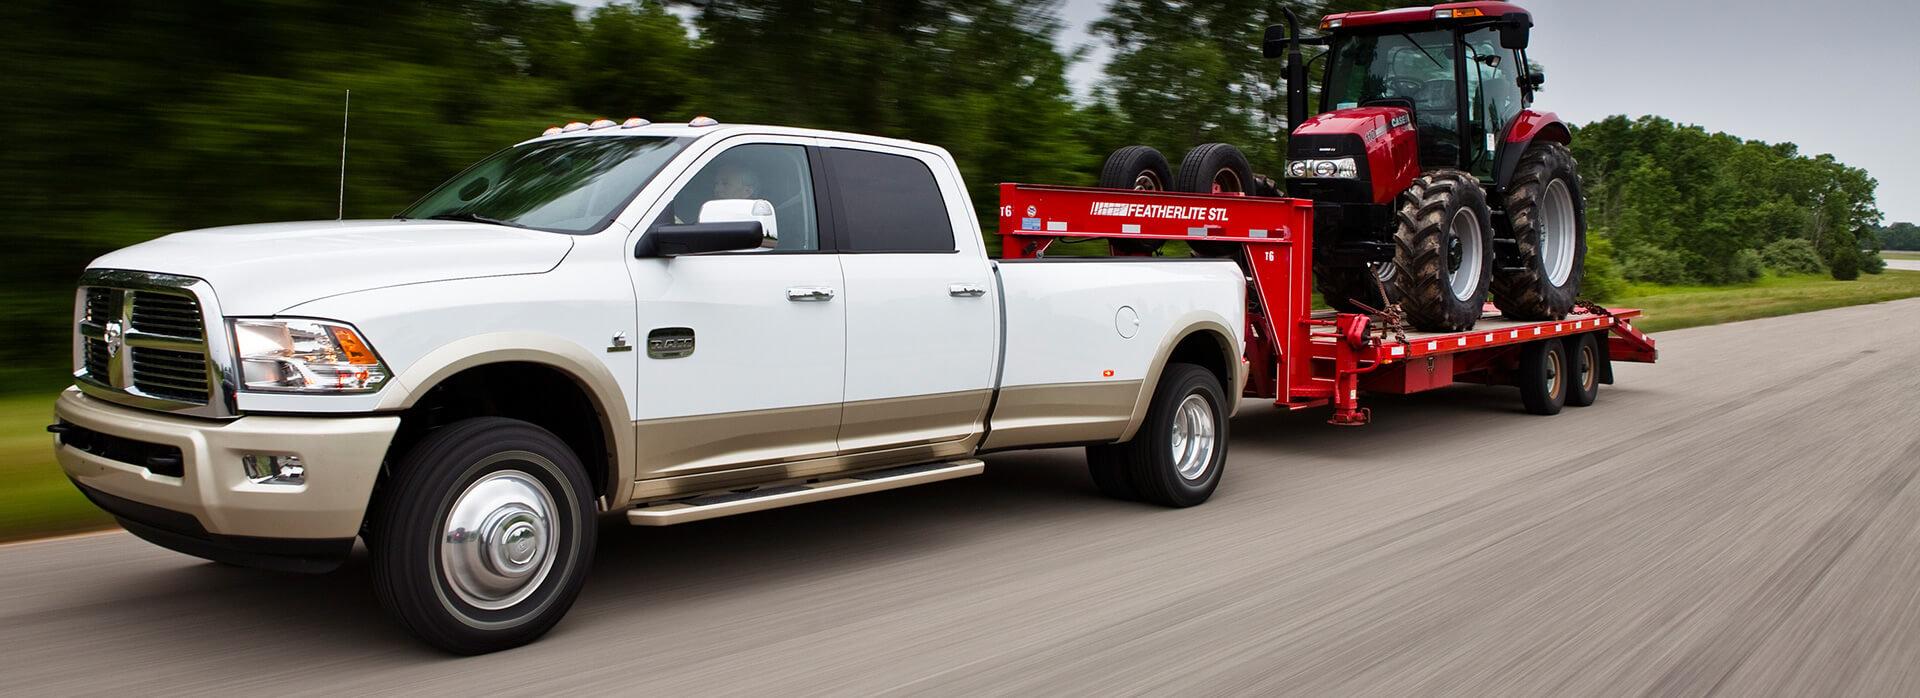 Duramax Diesel Trucks For Sale